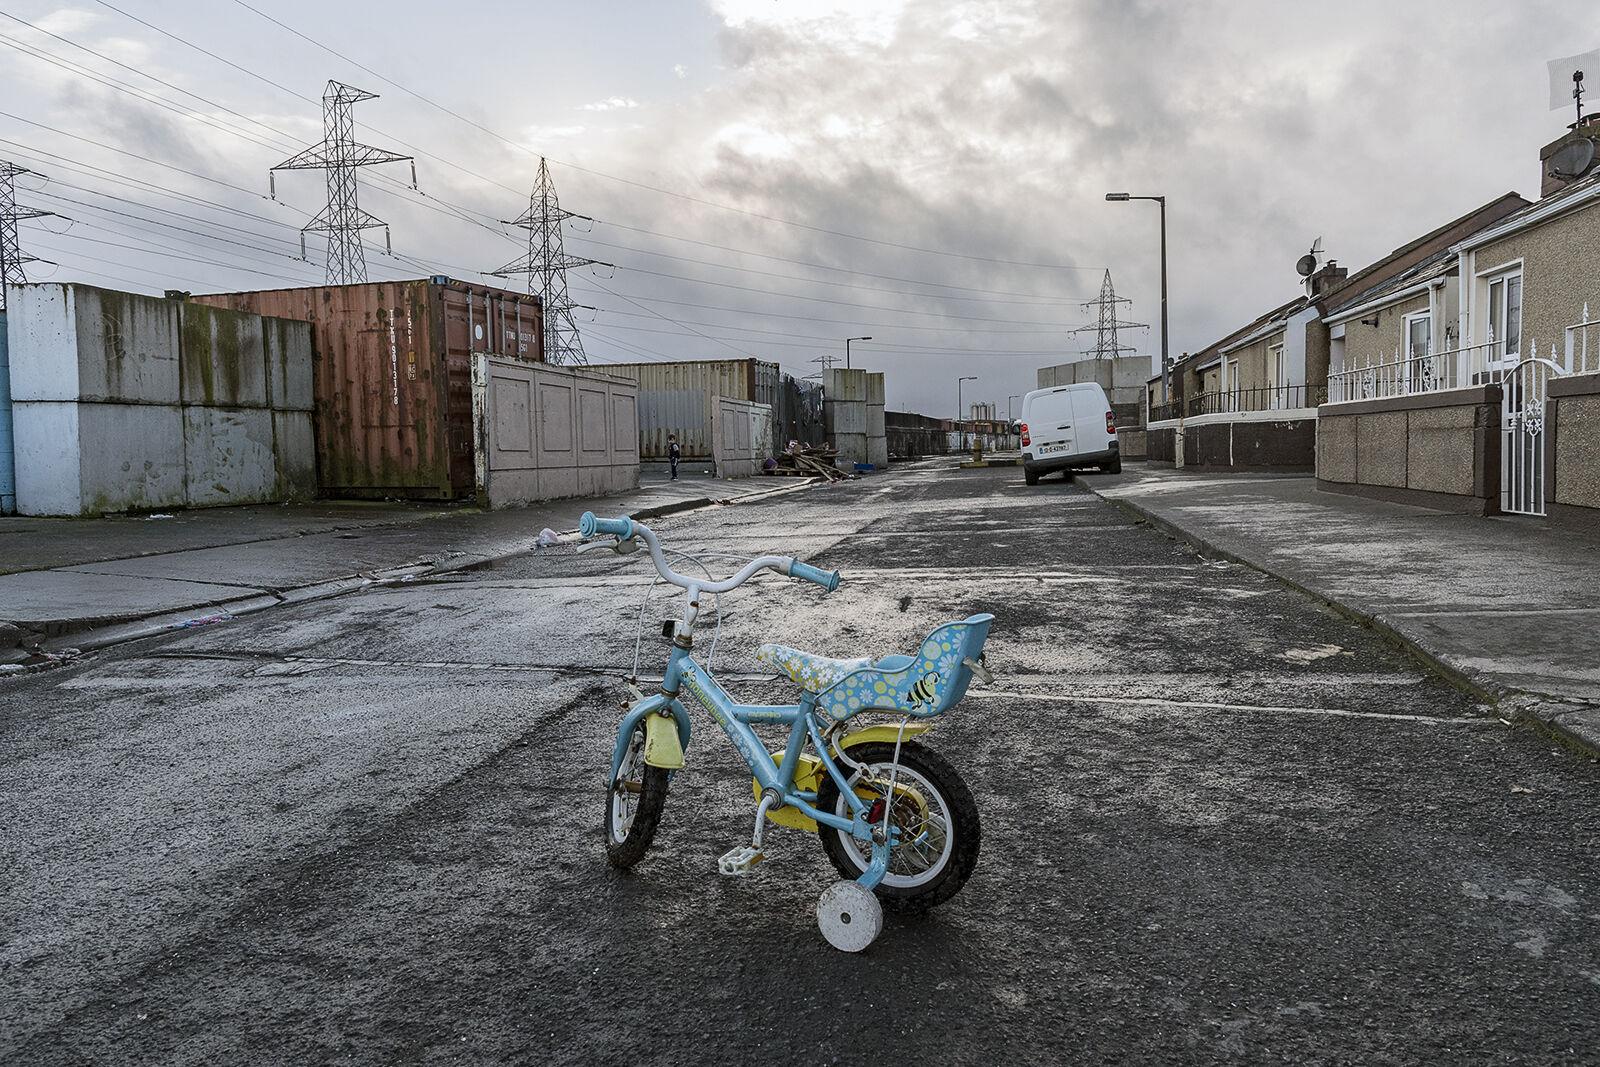 Child Bike, Dublin, Ireland 2020